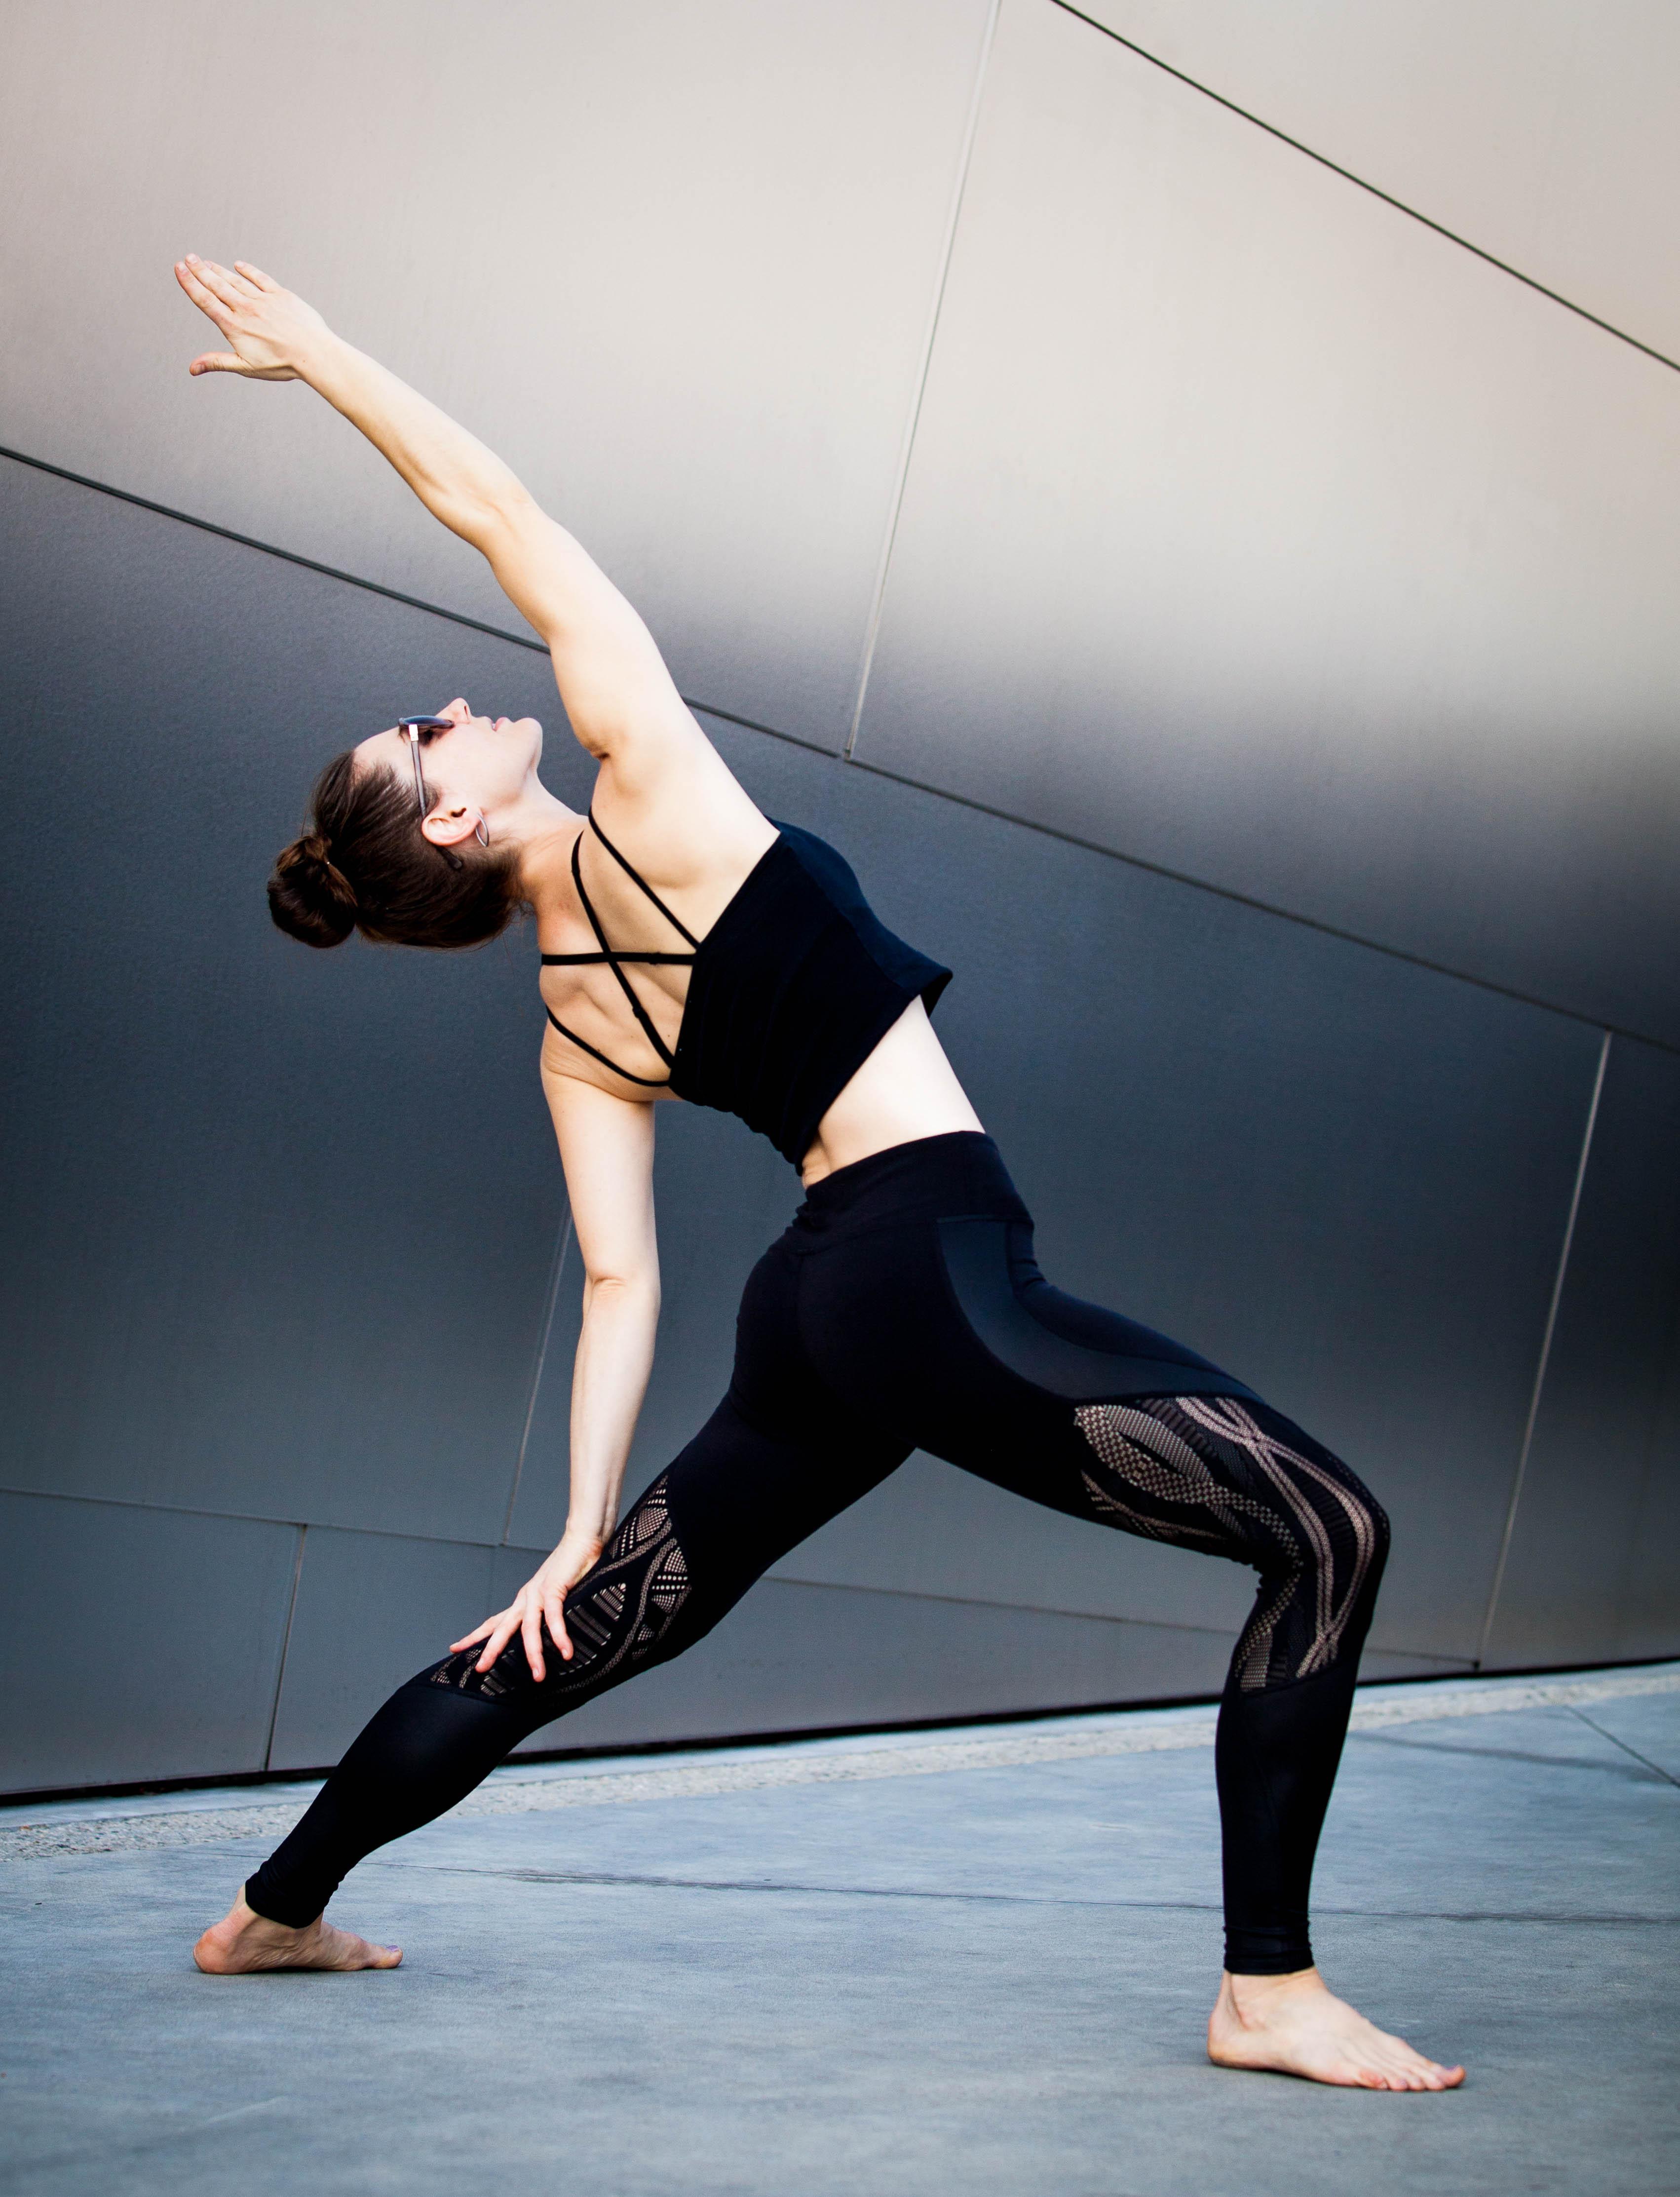 yoga acrobat artist kelsey strauch